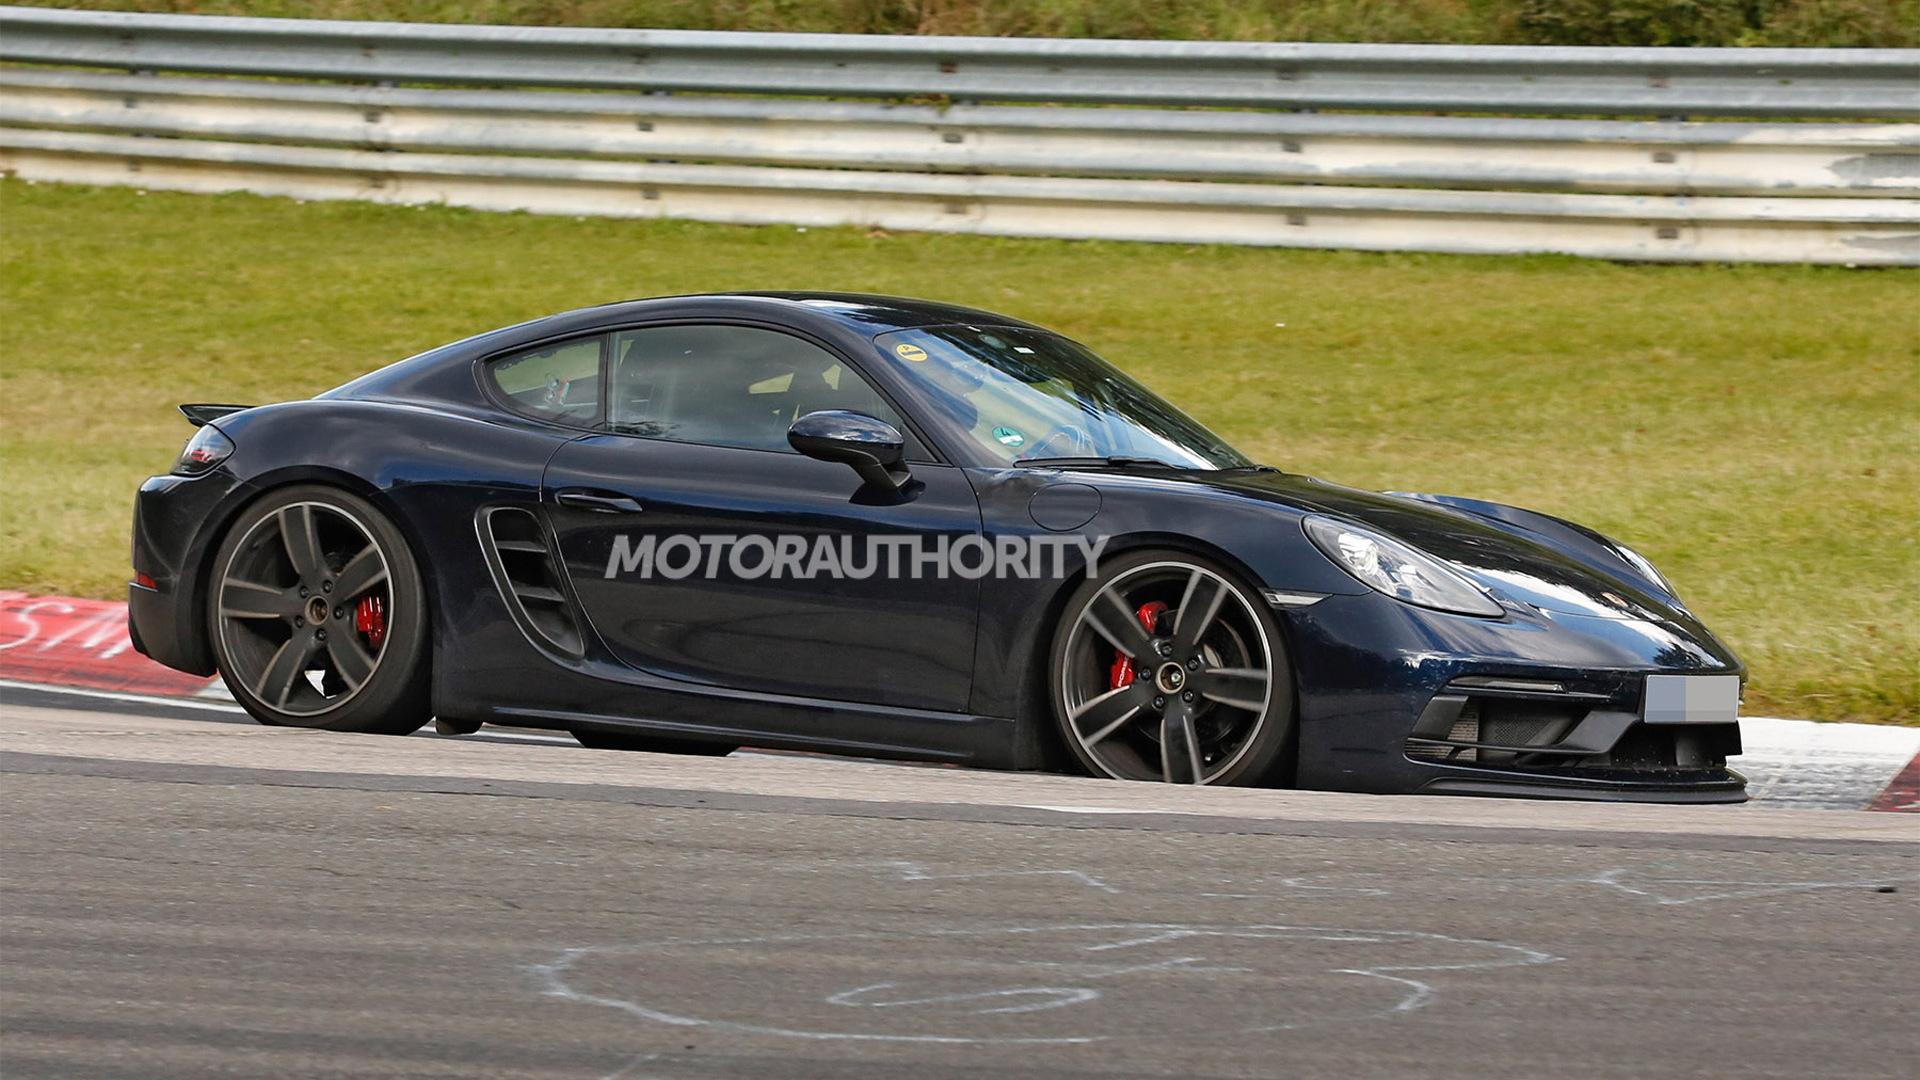 2018 Porsche 718 Cayman GTS spy shots - Image via S. Baldauf/SB-Medien